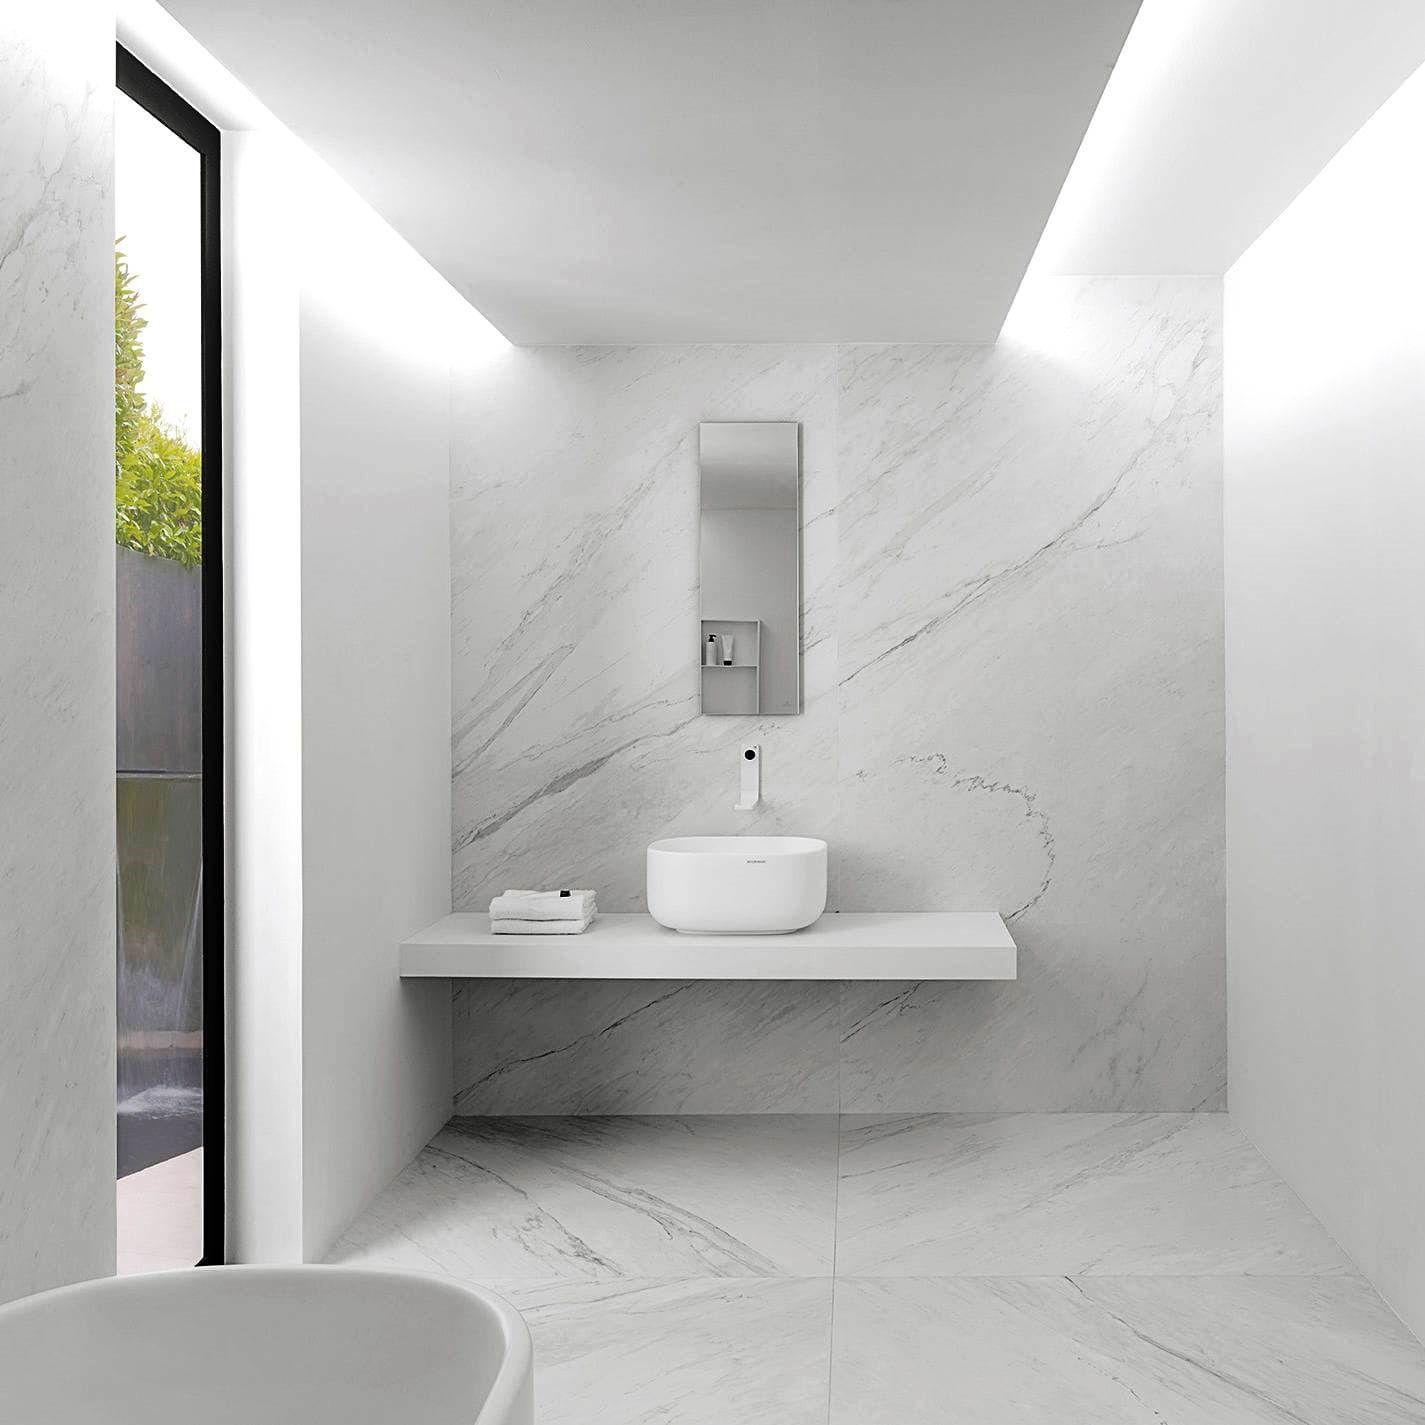 xlight large format porcelain tiles bathroom interior design marble tile bathroom bathroom on kitchen interior tiles id=42253